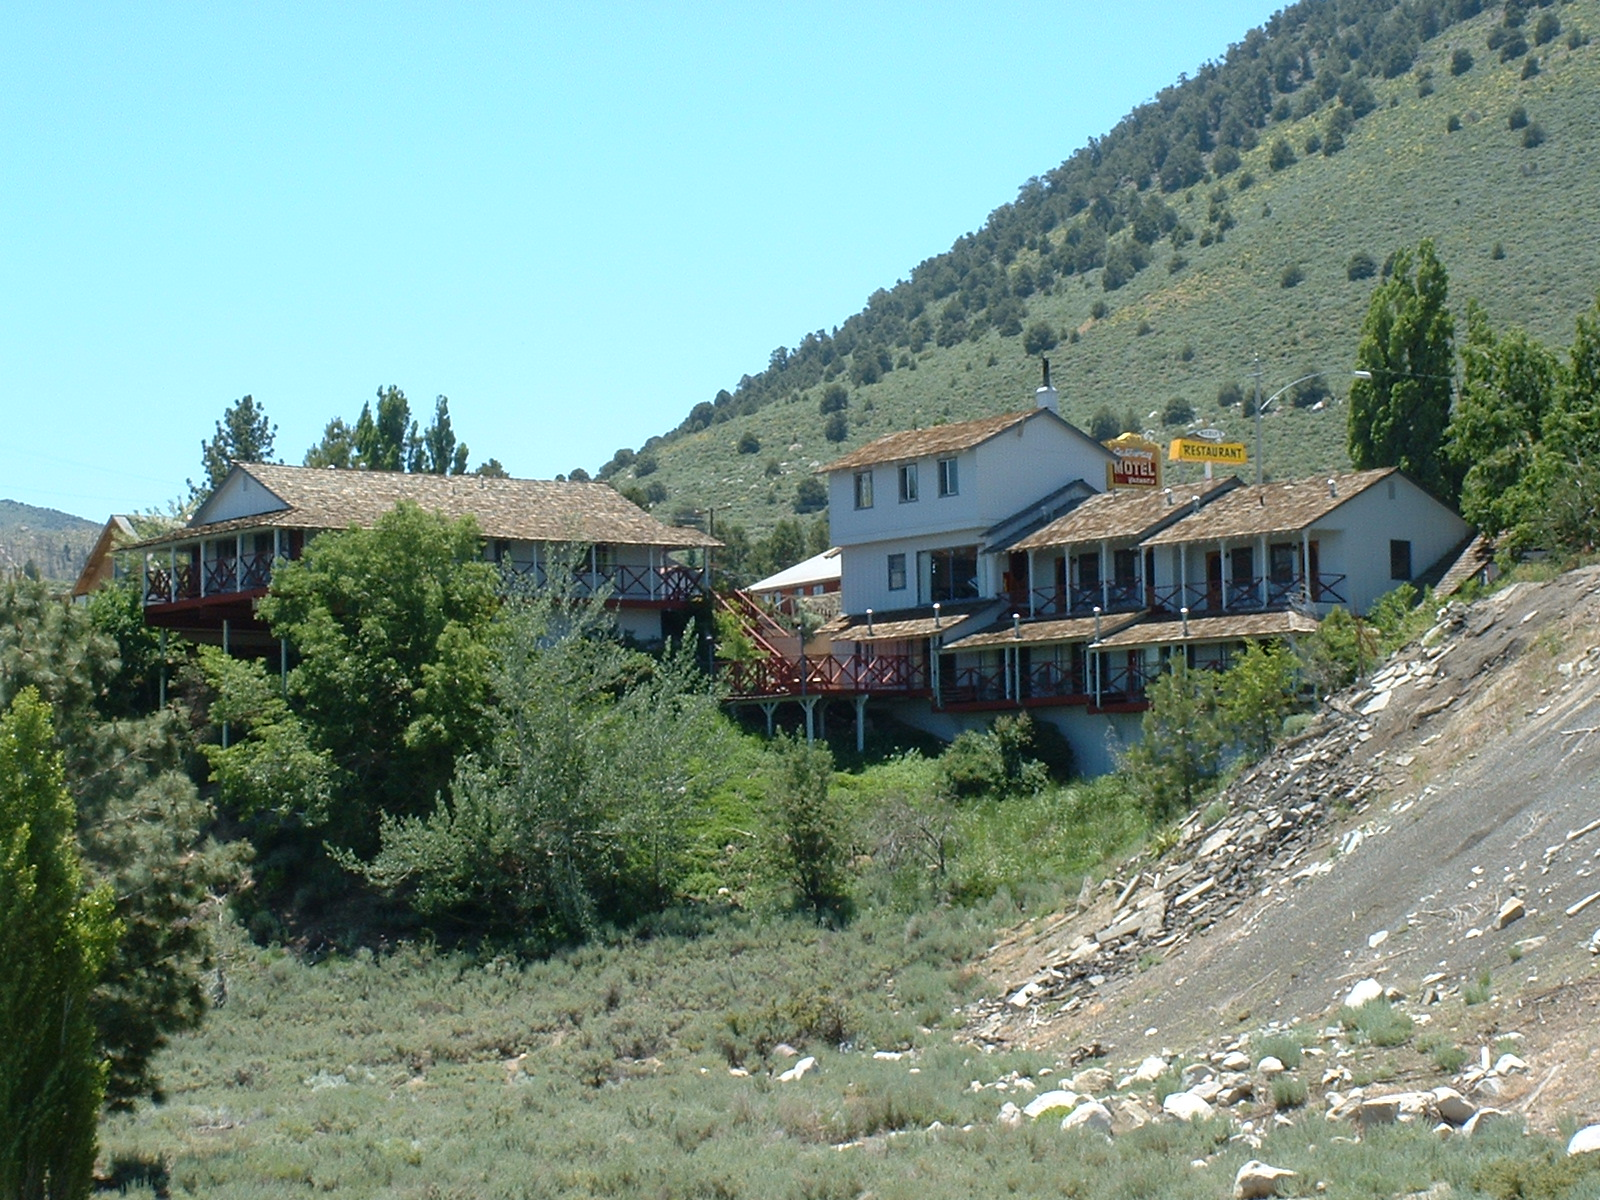 Yosemite motel